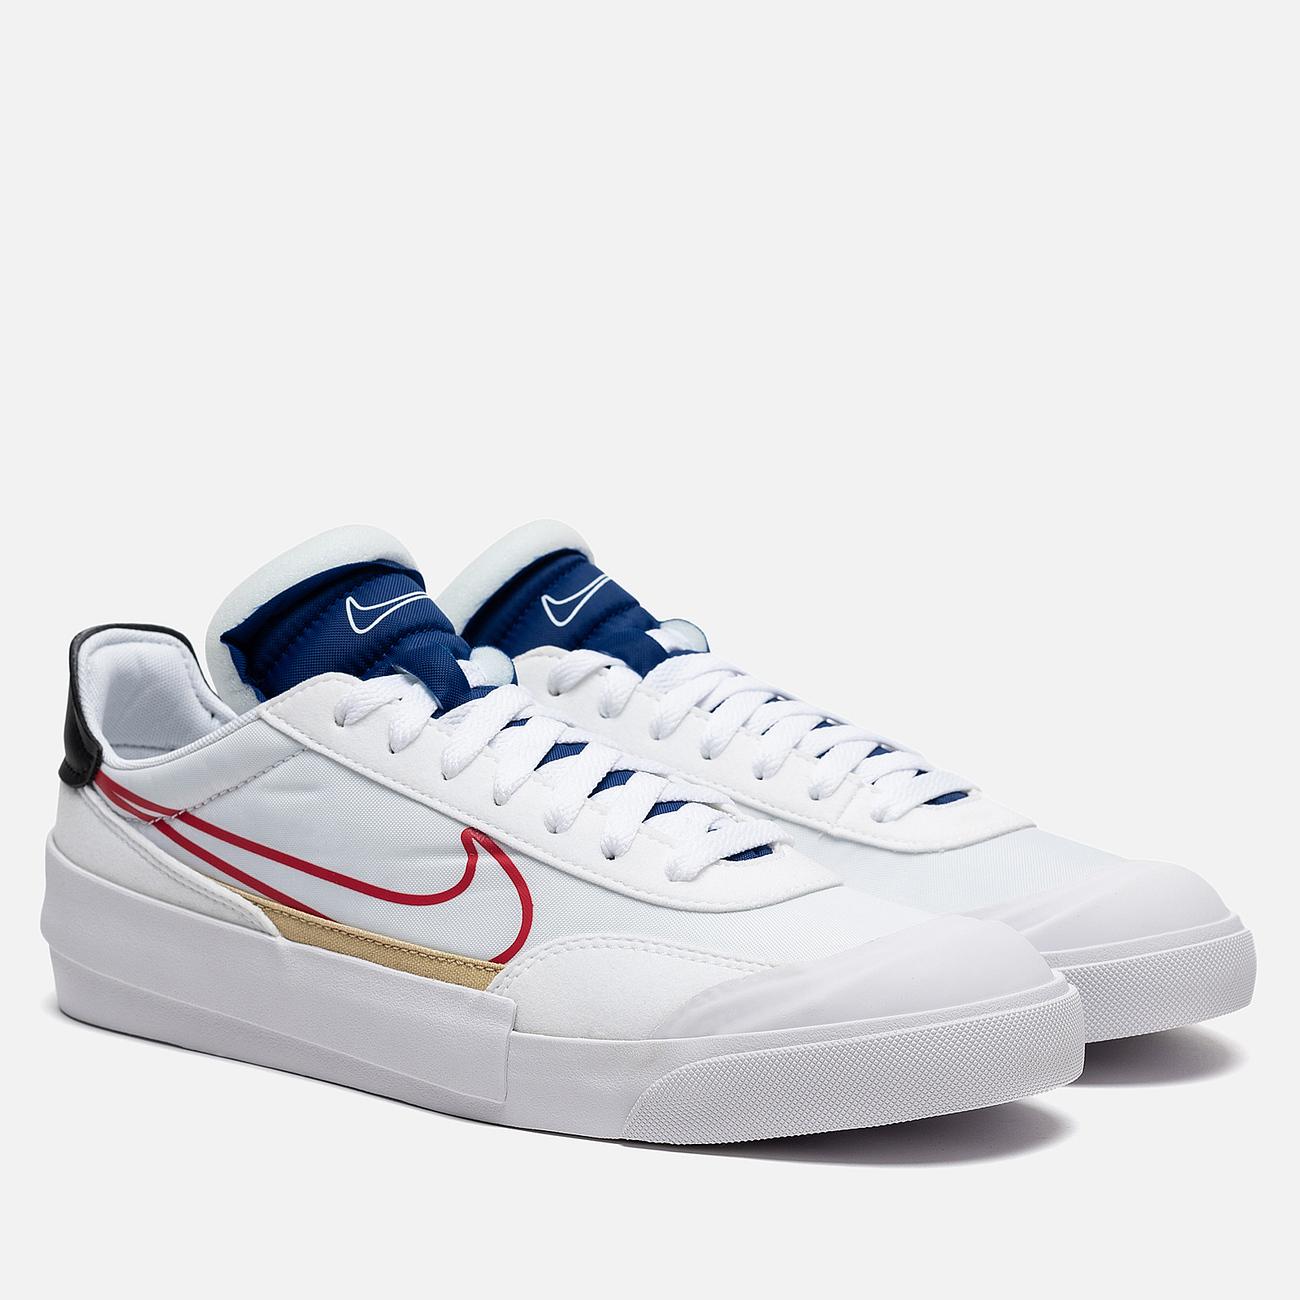 Кроссовки Nike Drop Type HBR White/University Red/Deep Royal Blue